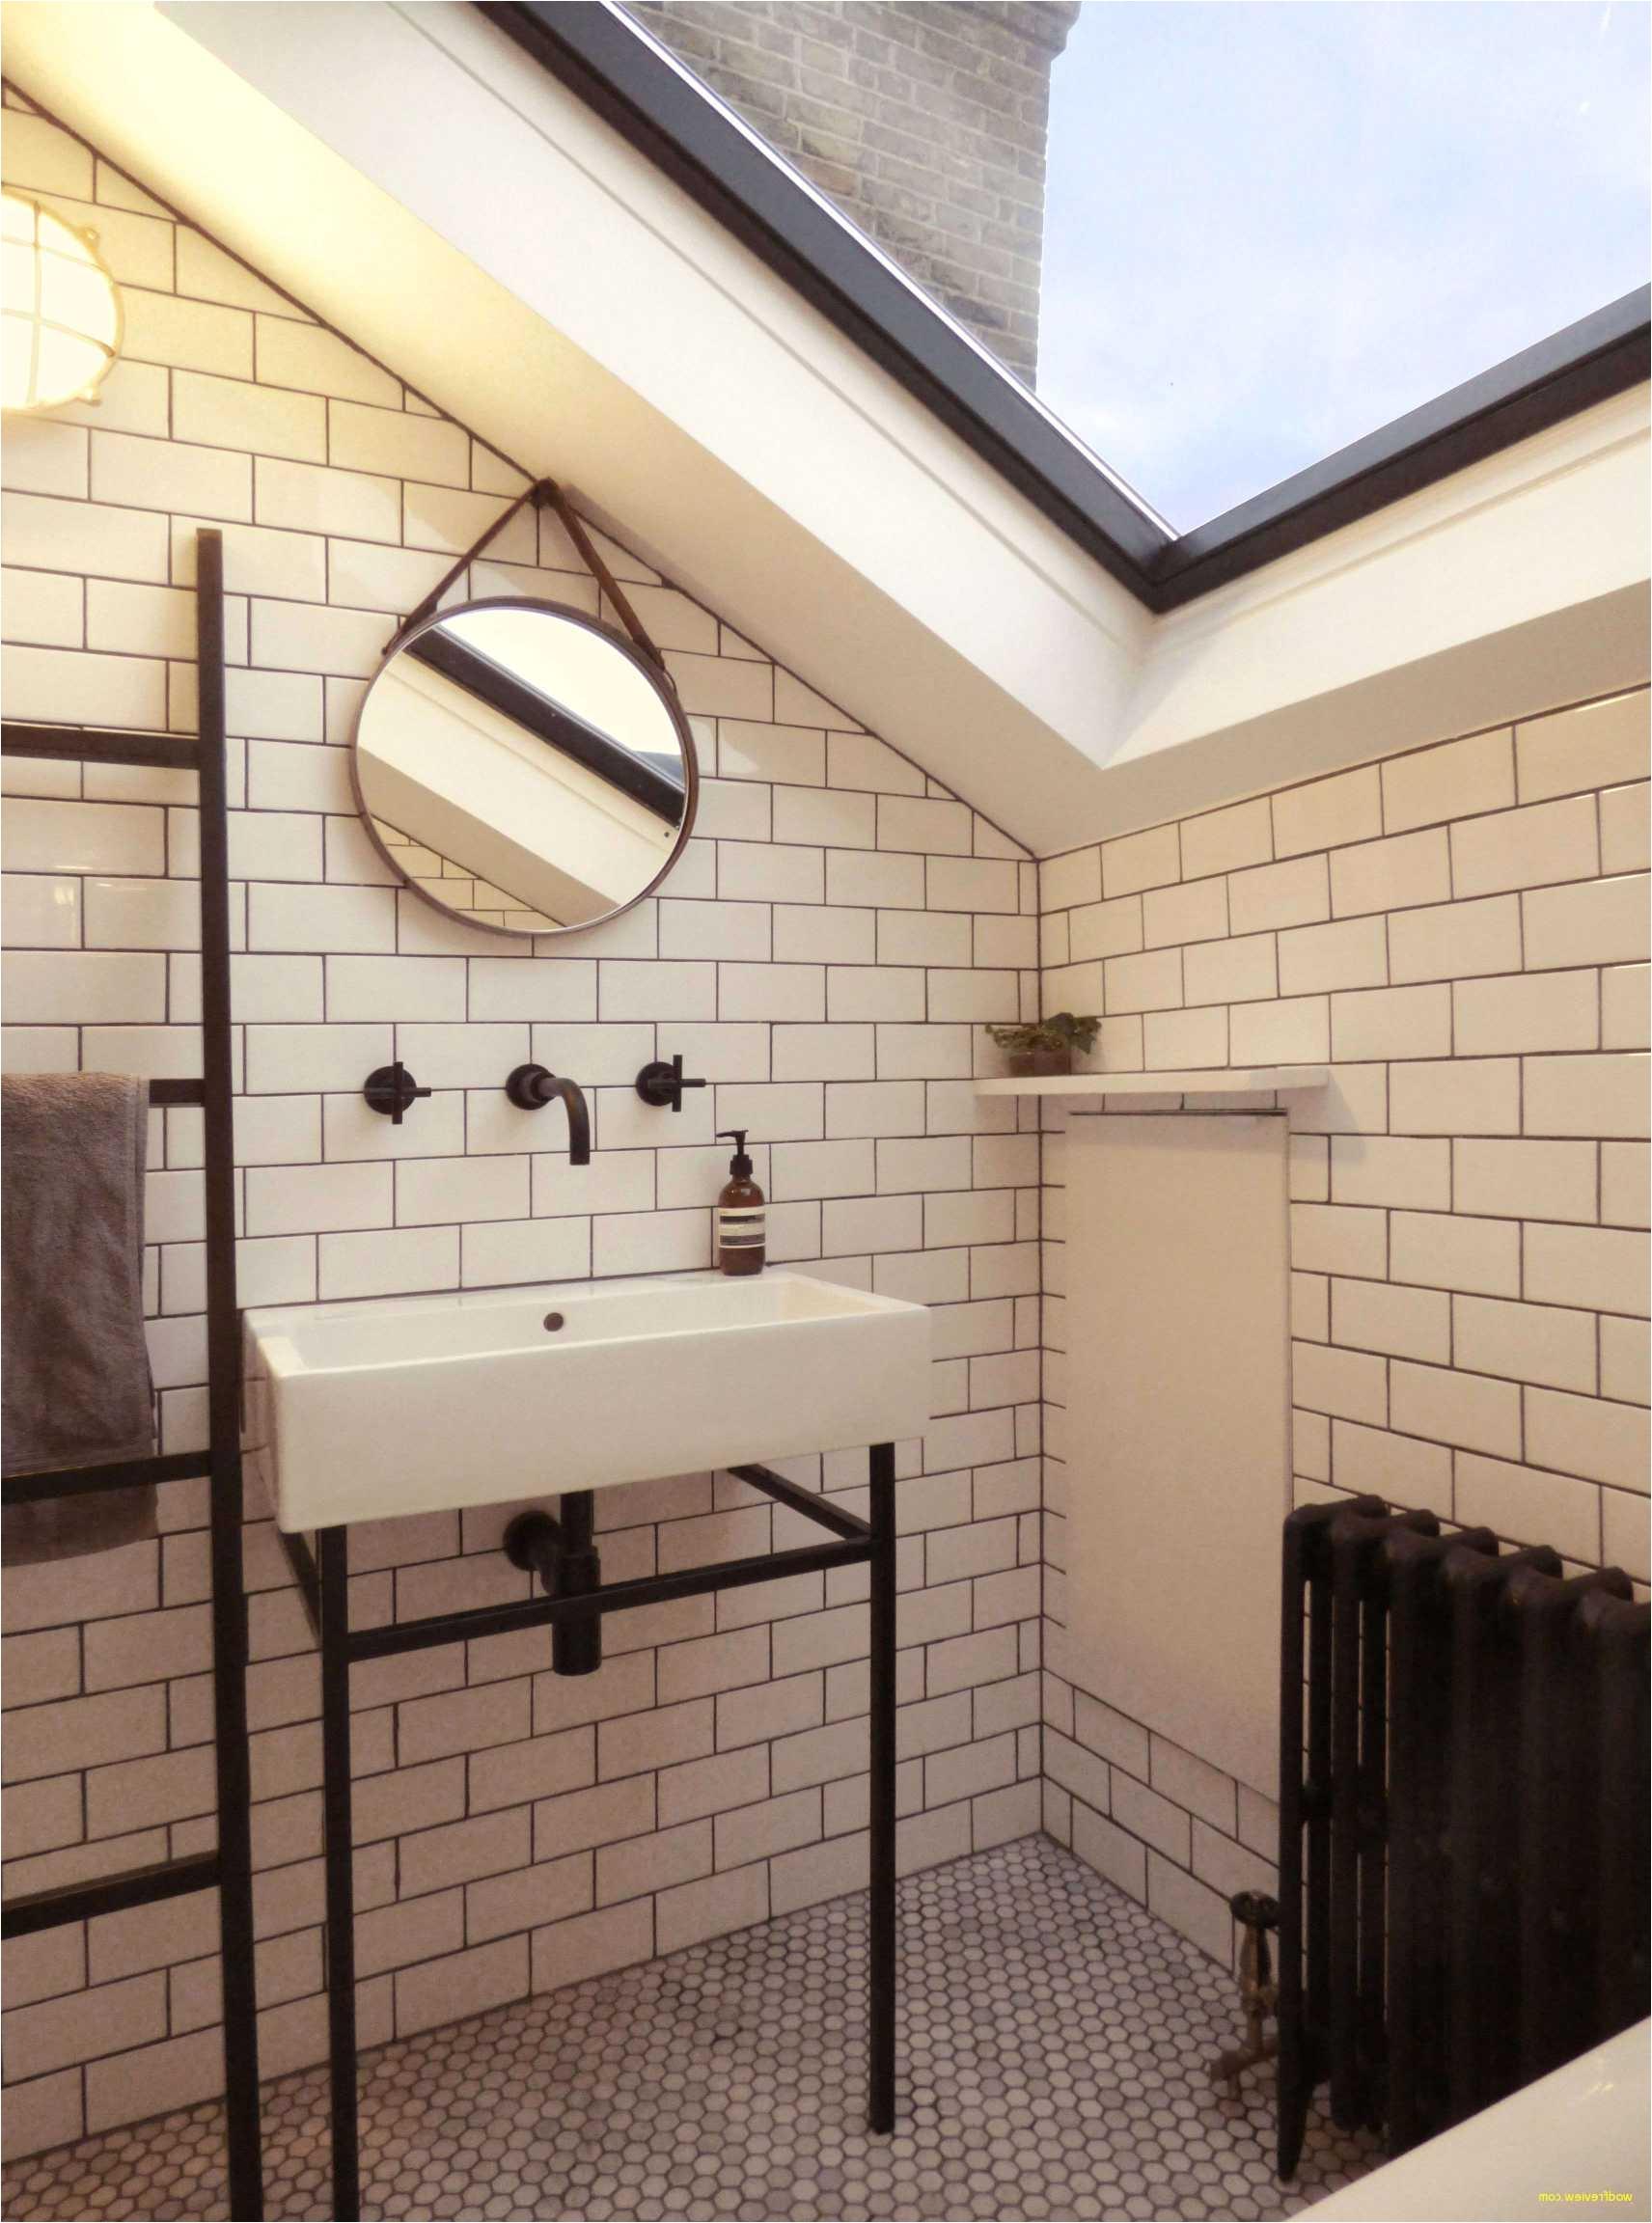 Bathtub Refinishing Denver Short Information Denver Bathtub Refinishing Review Bathtubs